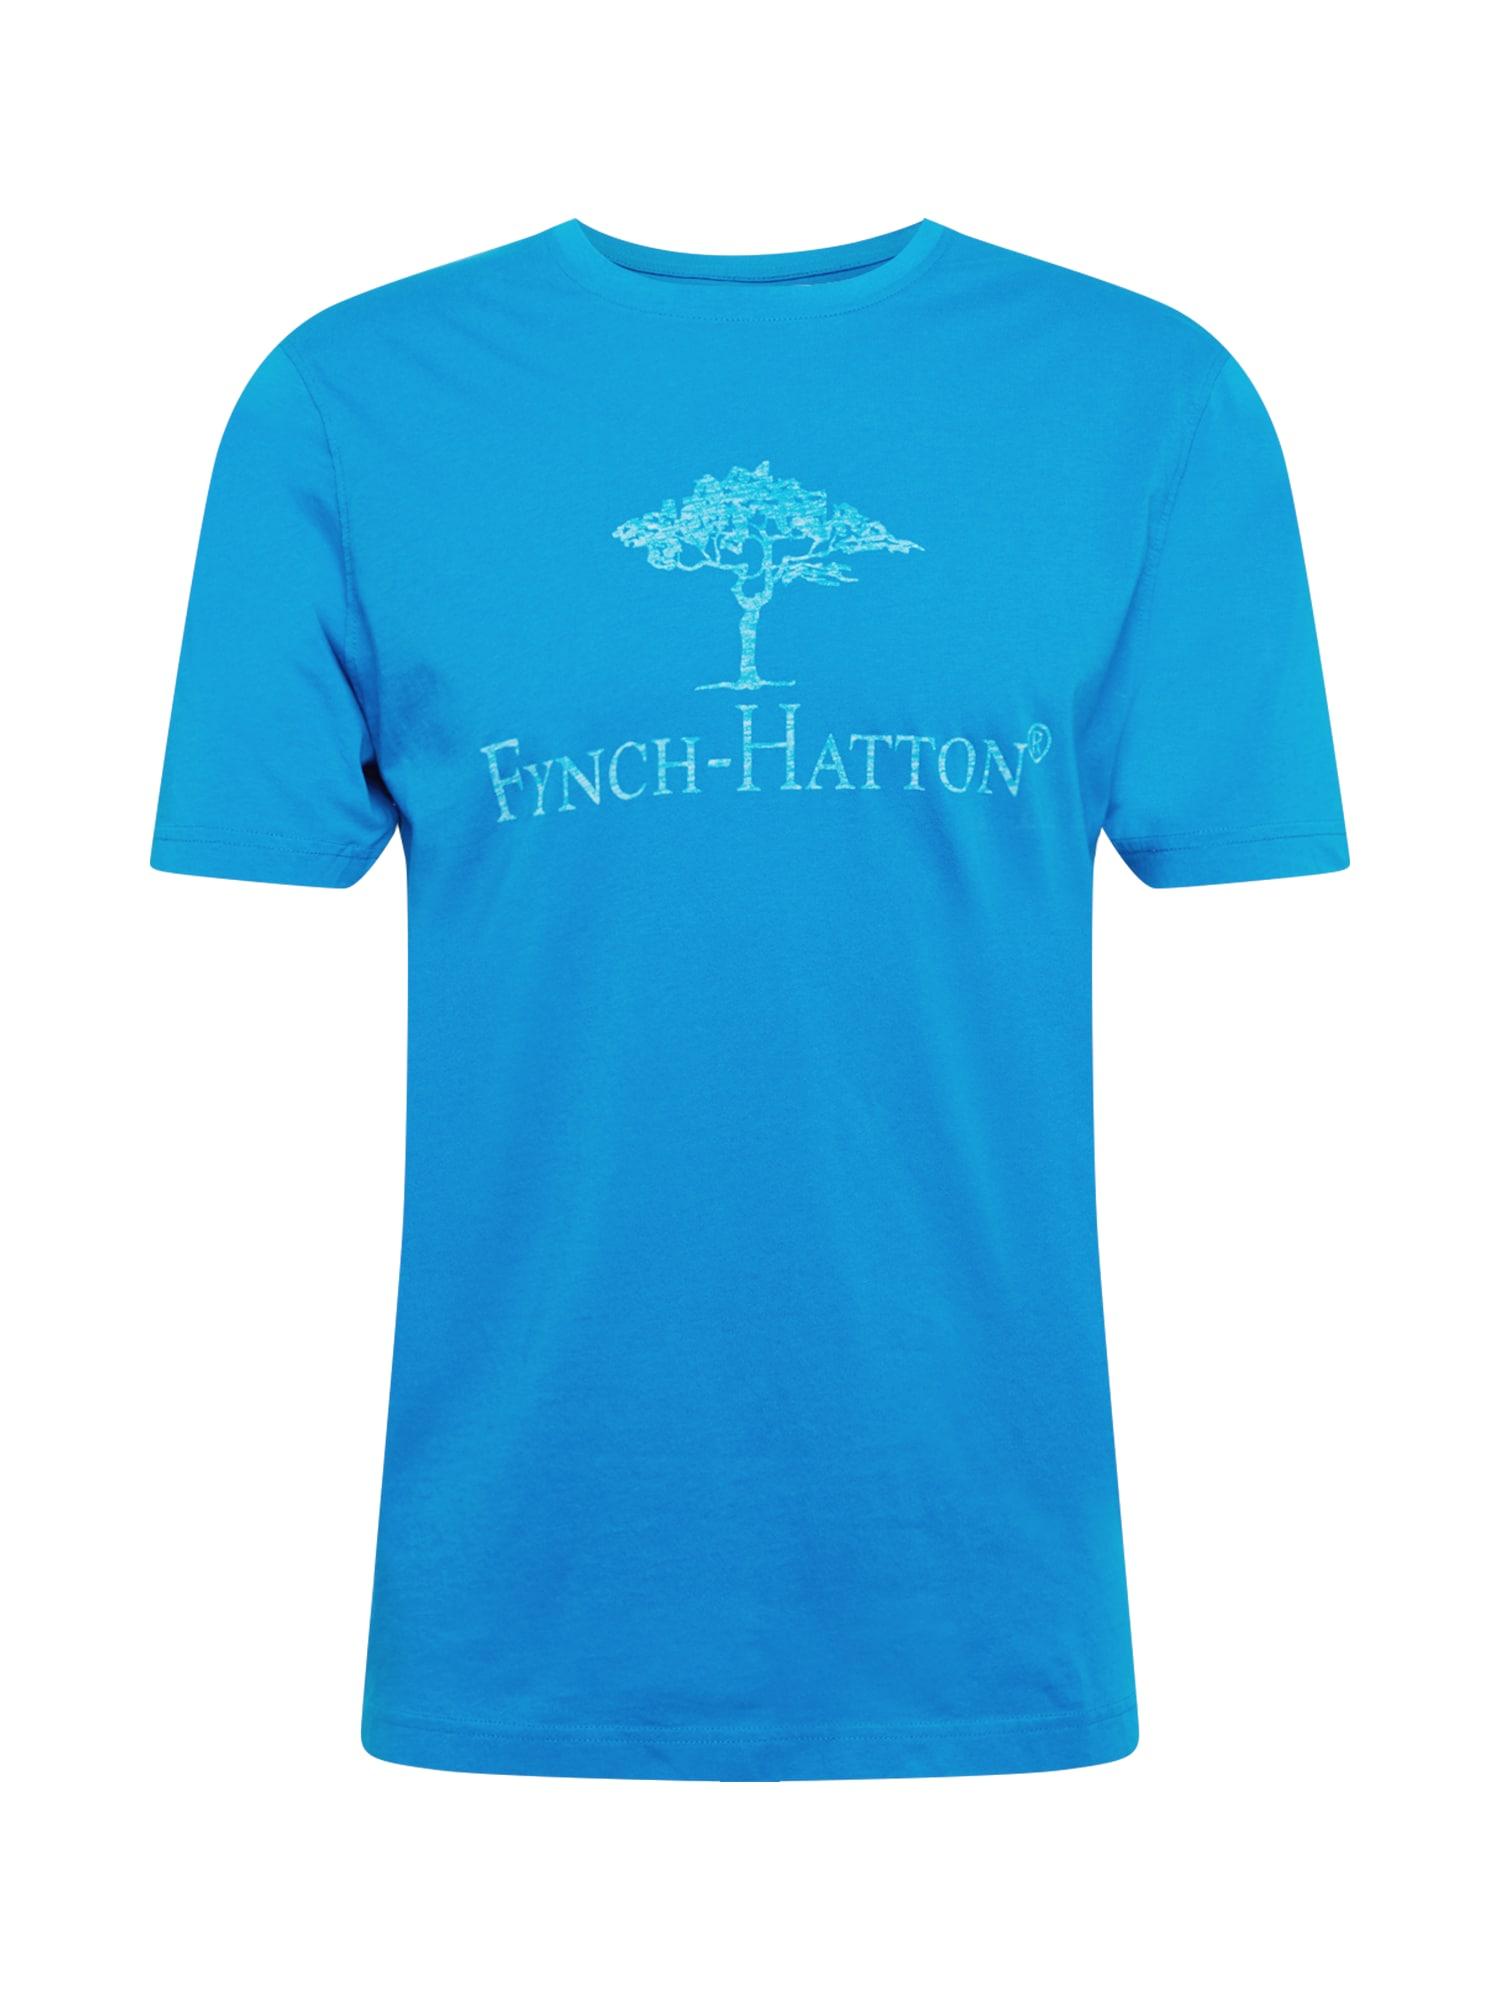 FYNCH-HATTON Marškinėliai mėlyna / turkio spalva